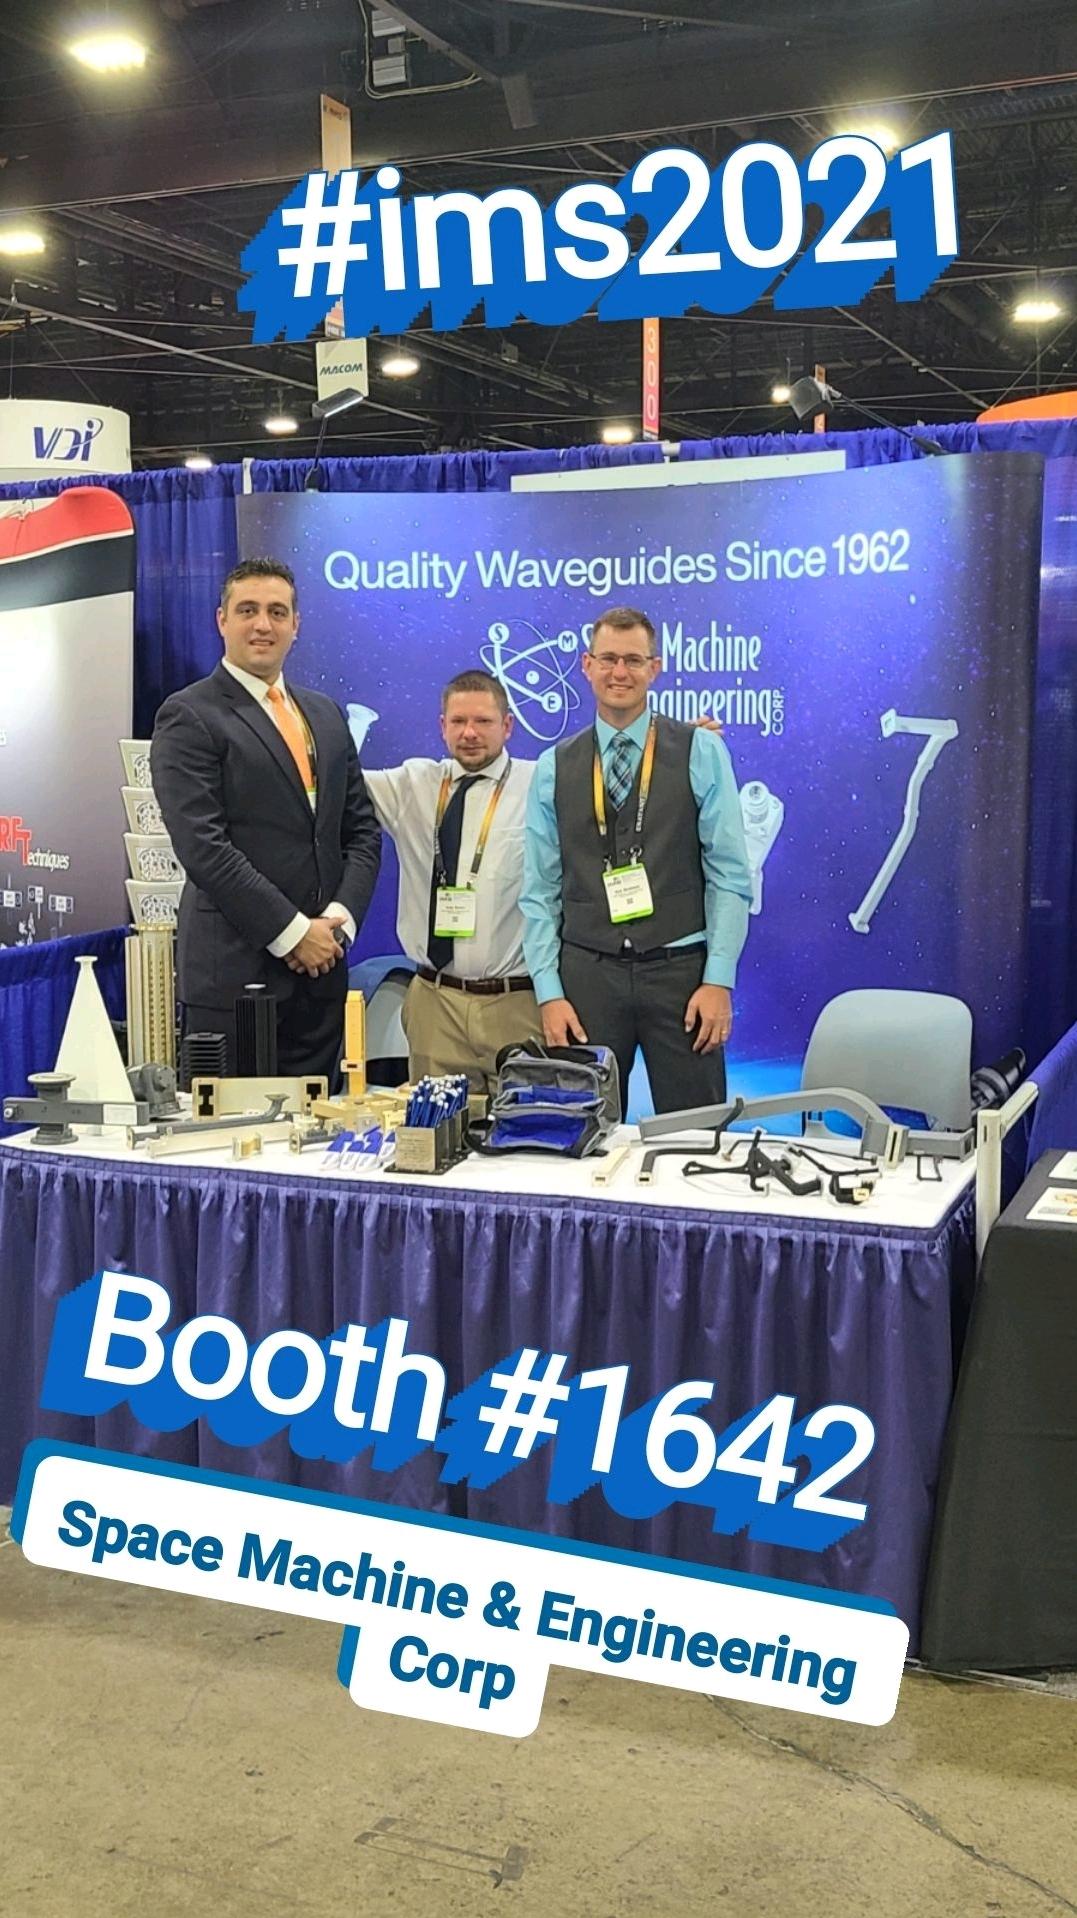 SME Team at Booth #1642 at IMS2021